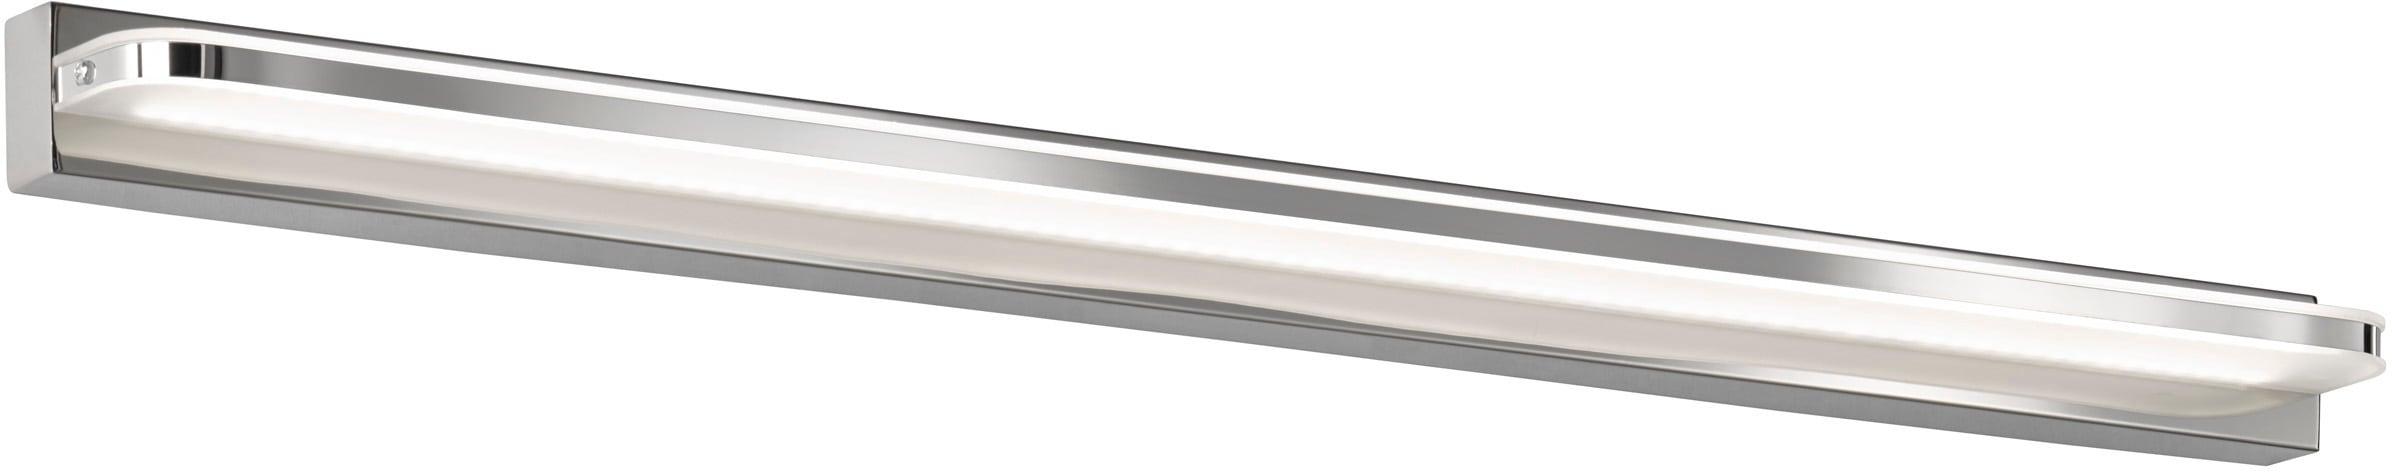 WOFI,LED Wandleuchte Eline